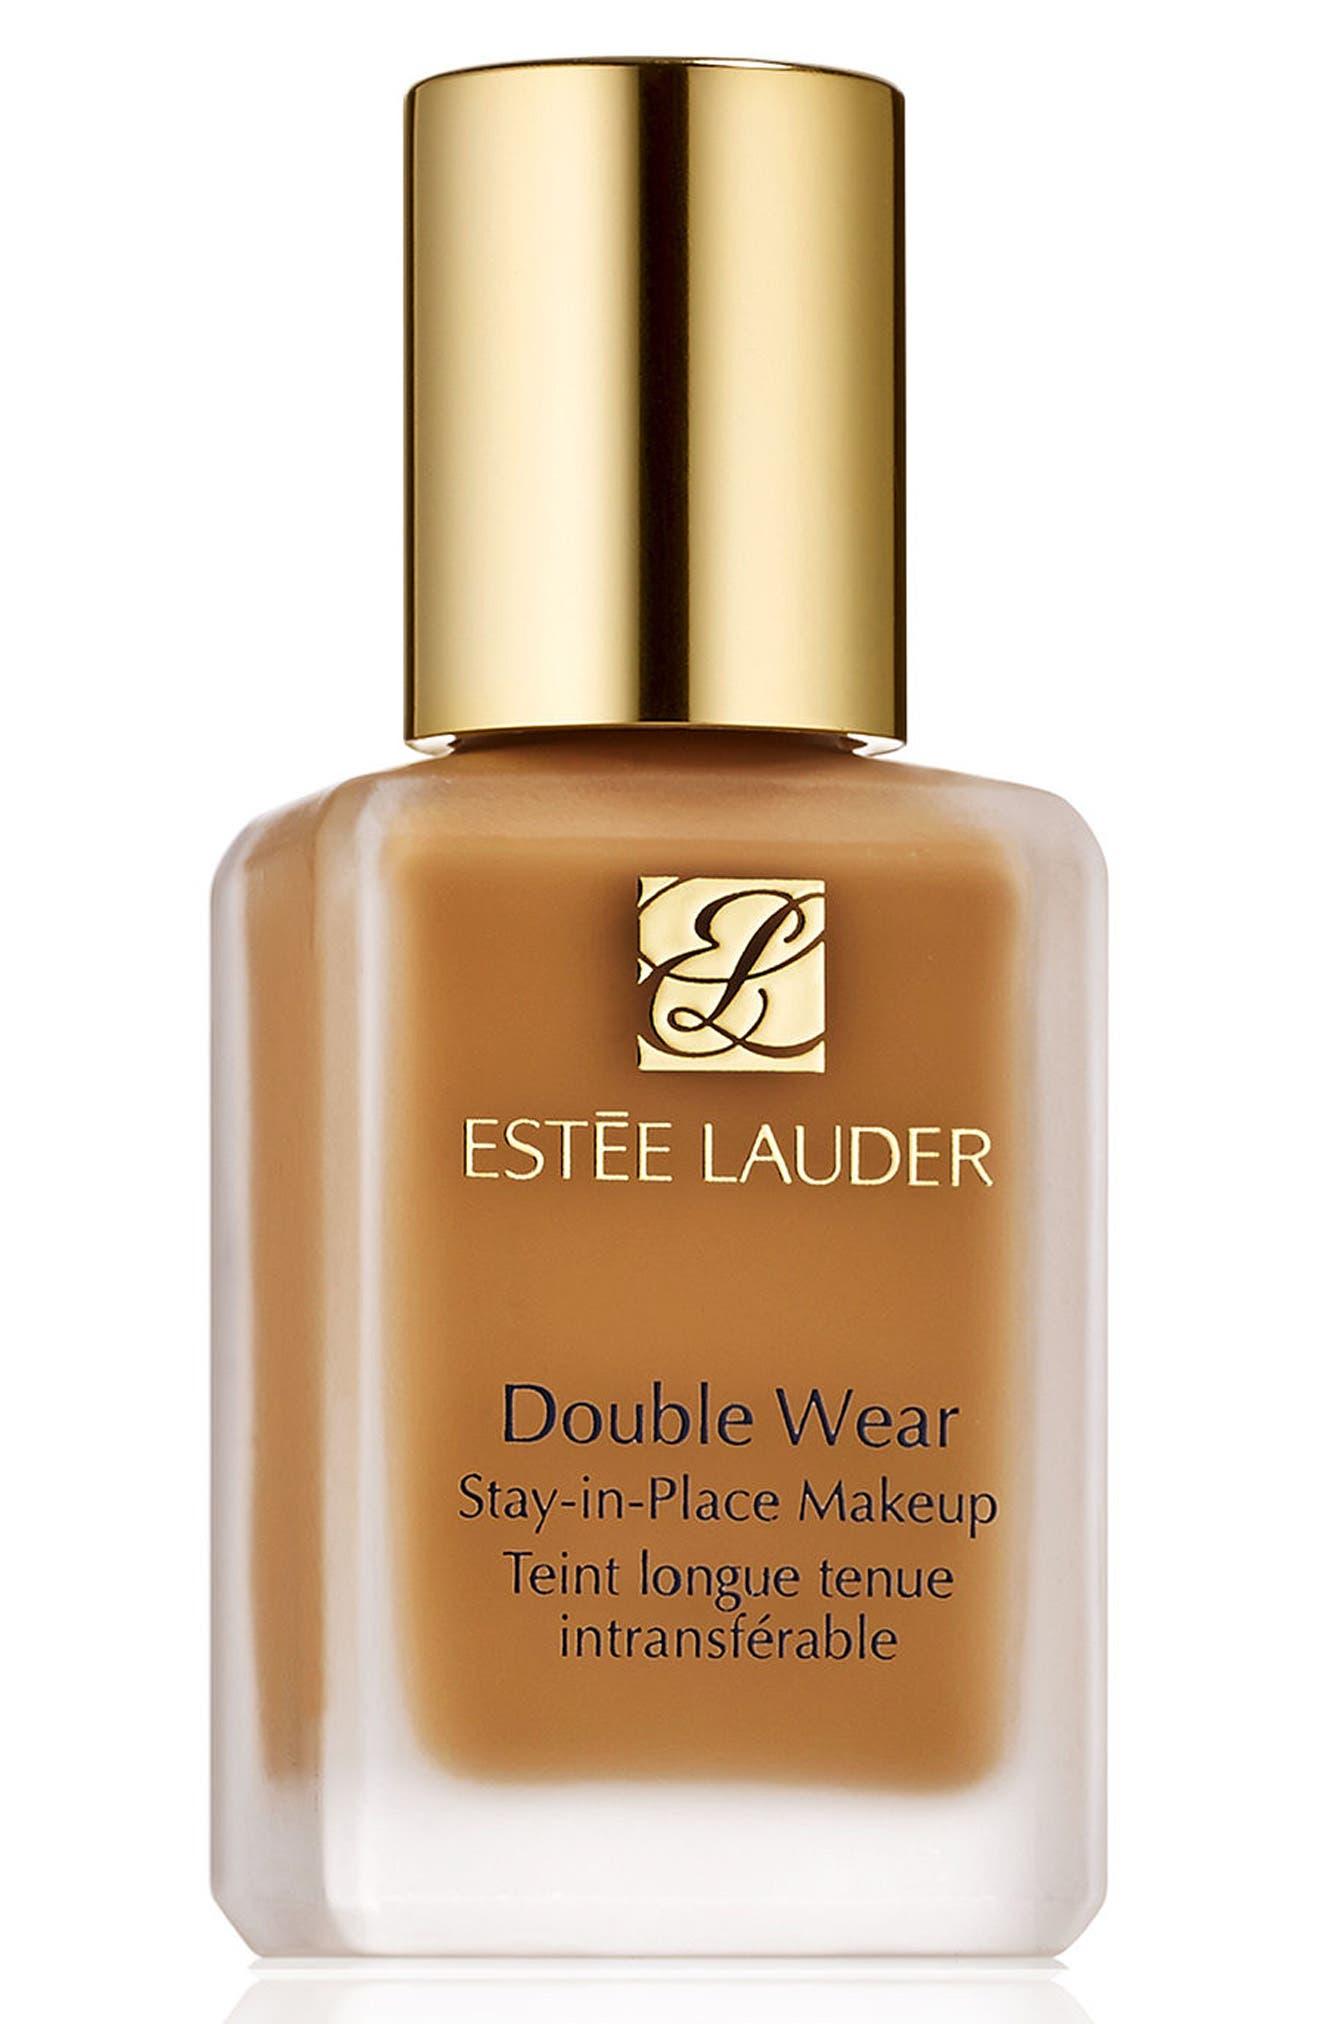 Estee Lauder Double Wear Stay-In-Place Liquid Makeup - 5W2 Rich Caramel